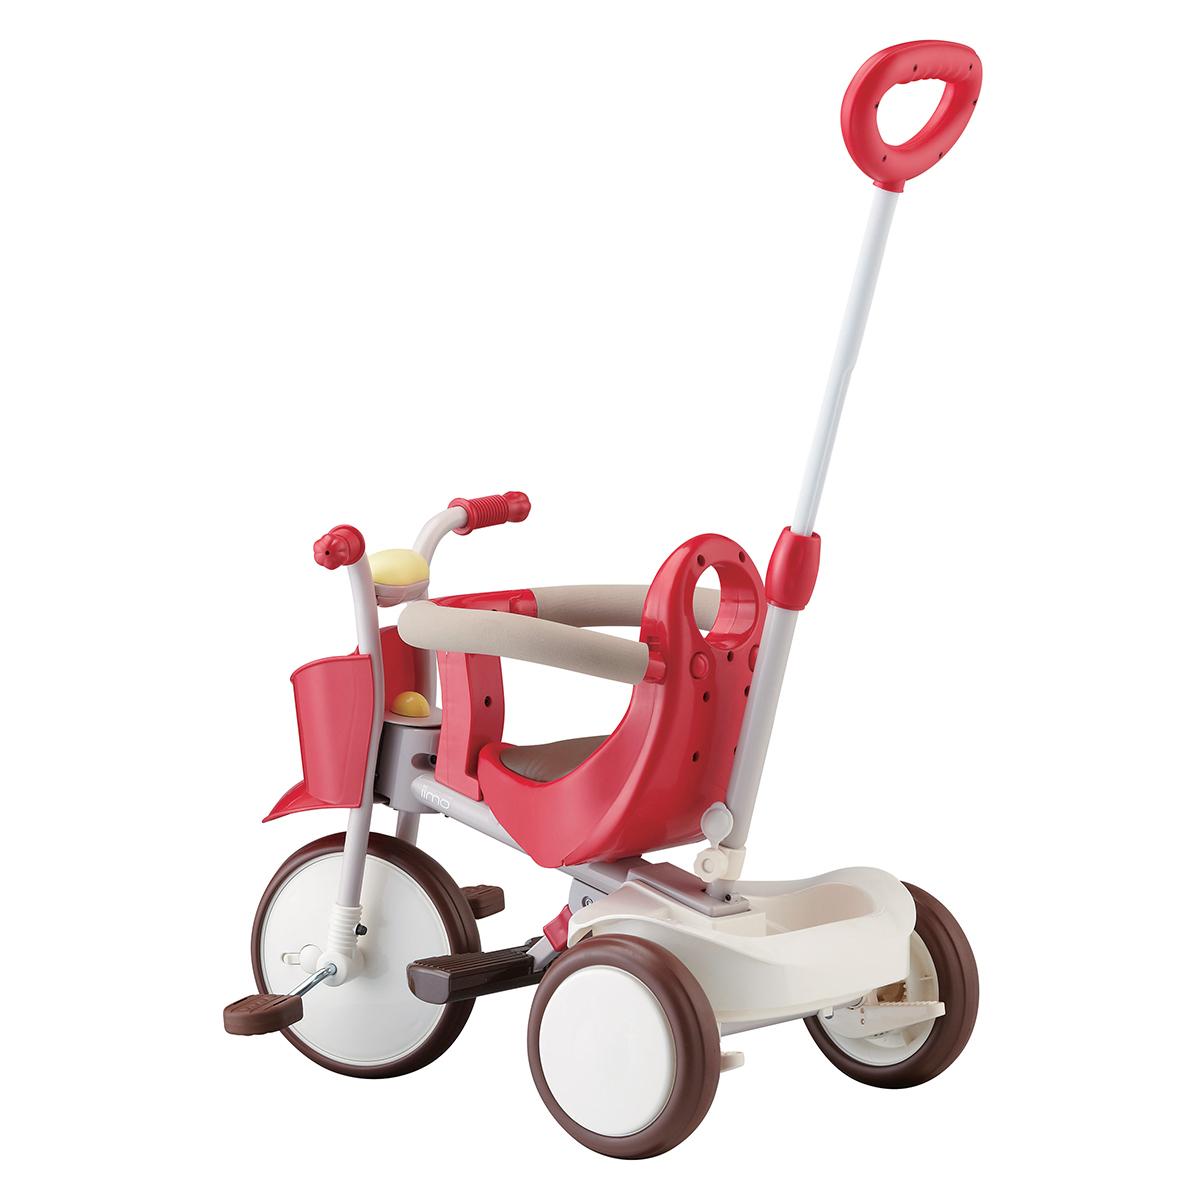 Trotteur & Porteur Tricycle Evolutif - Vital Red Tricycle Evolutif - Vital Red